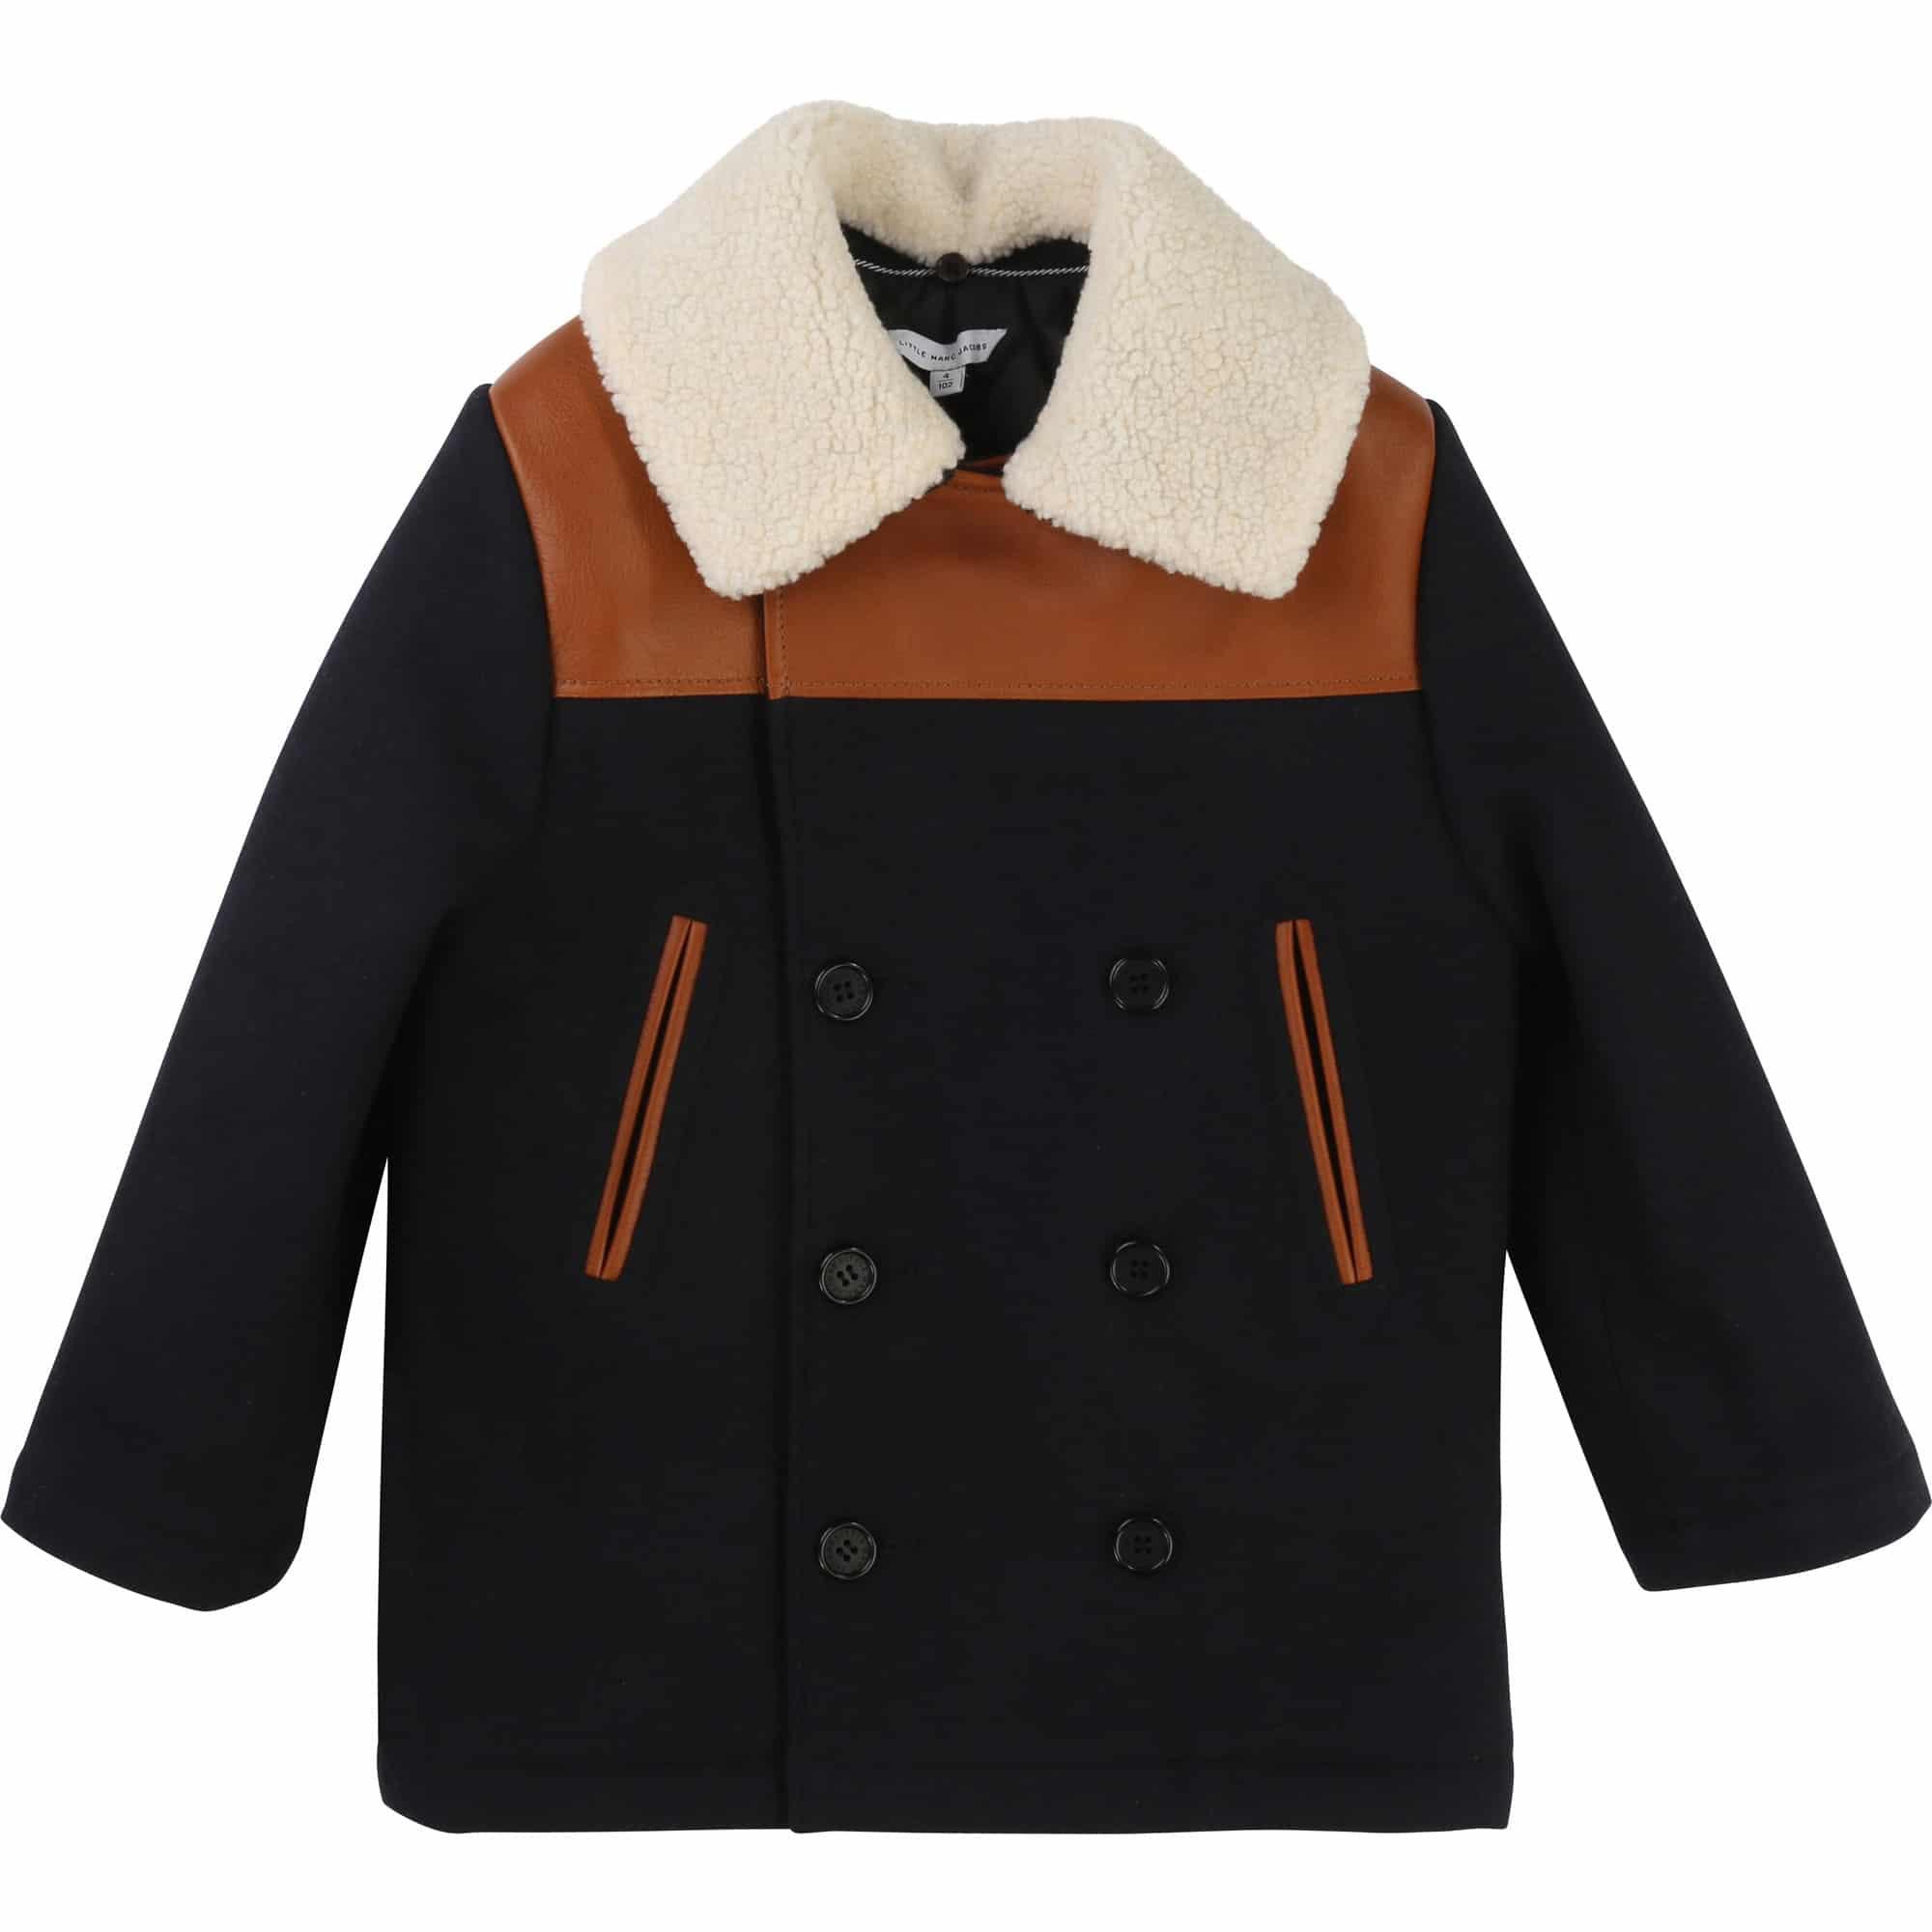 Little Marc Jacobs jacket kids fashion 2015